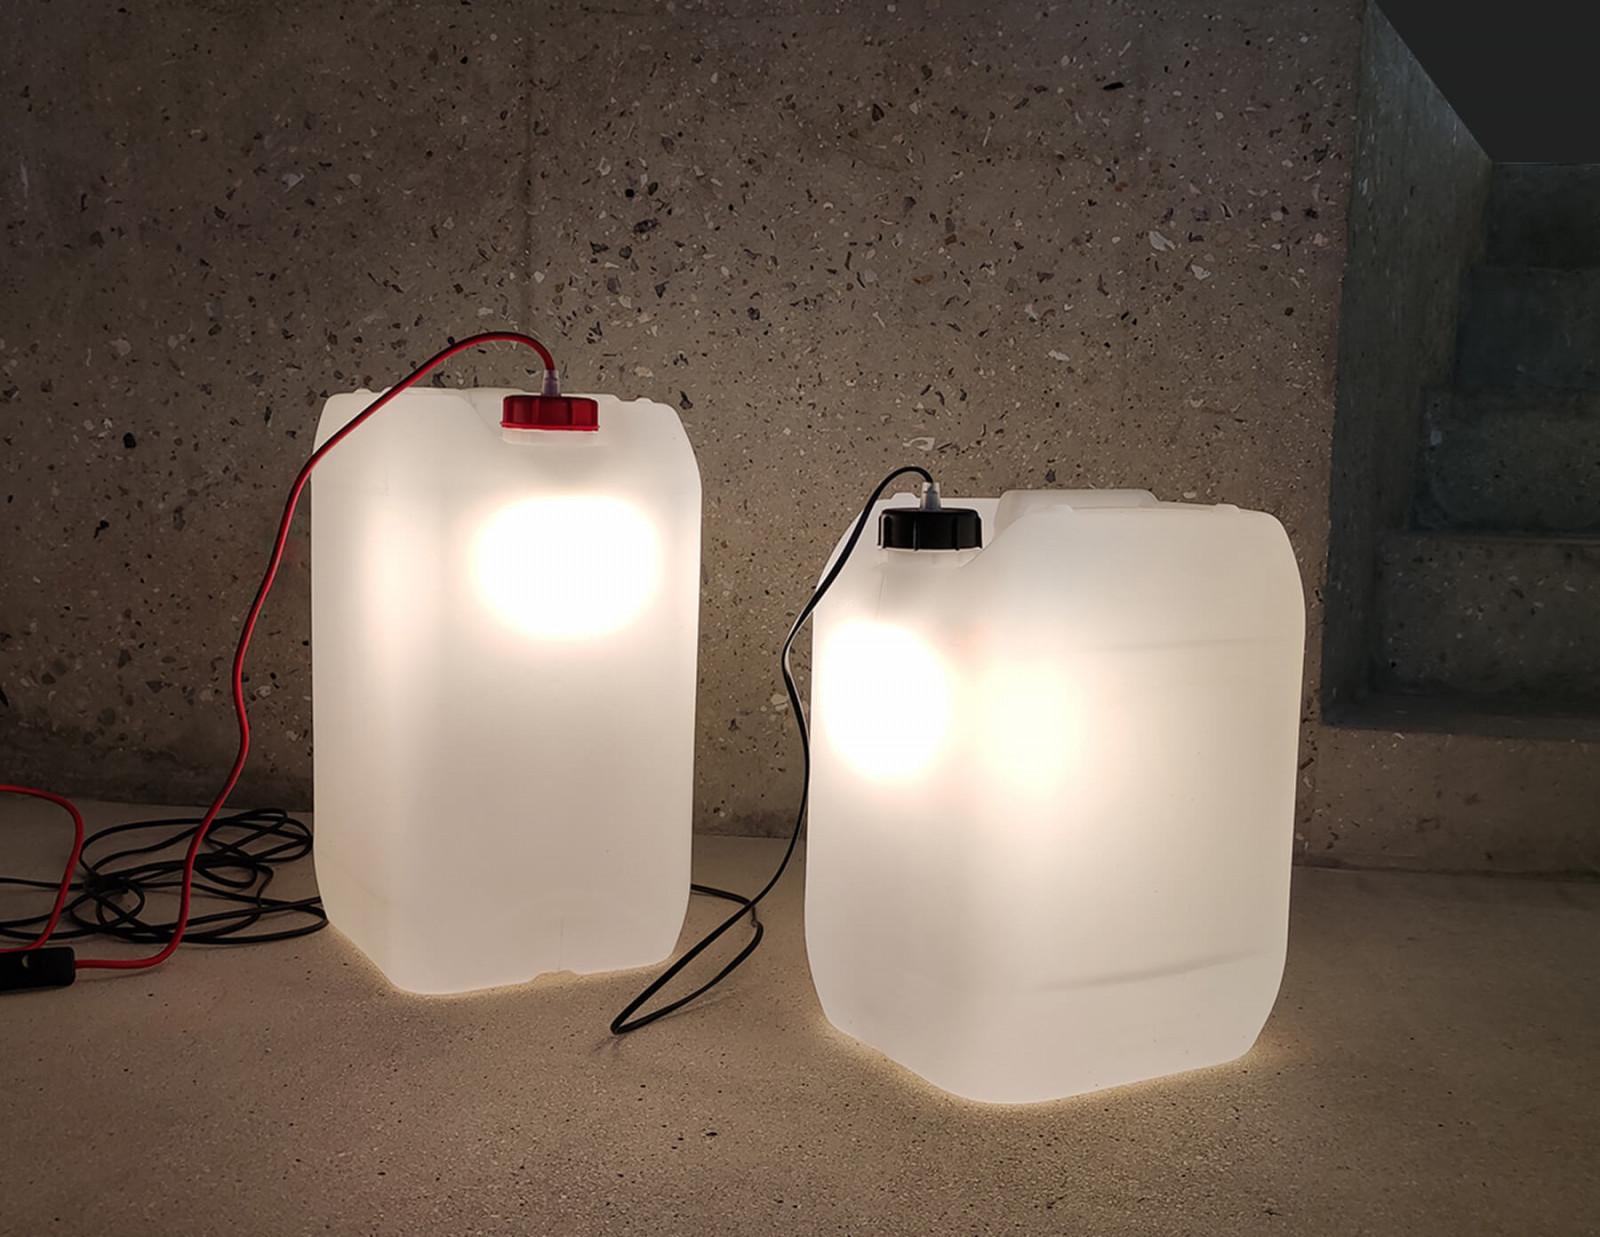 graam-jerry-mobilier-luminaires-jerricans-bidons-reemploi